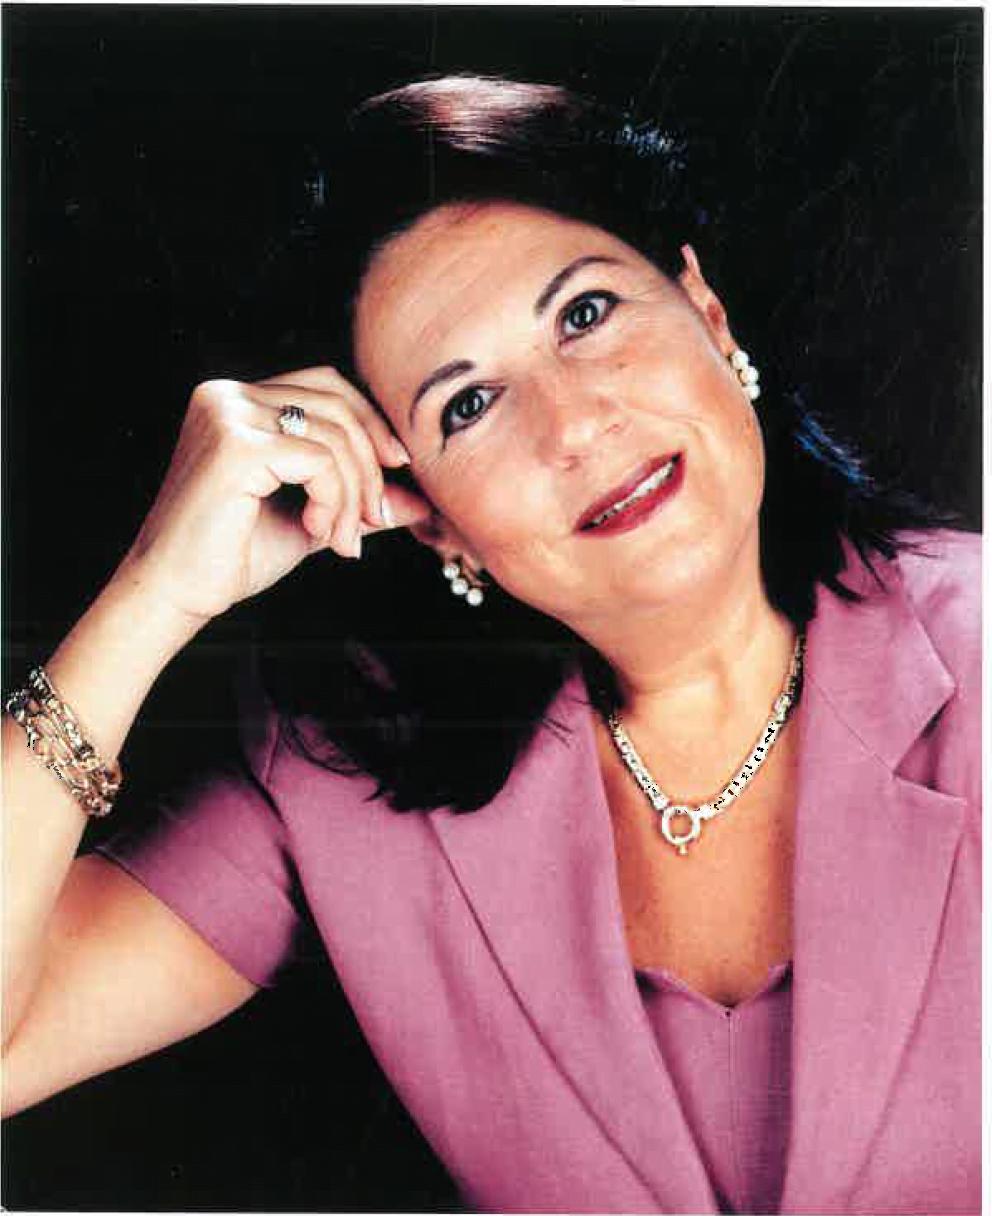 Glòria Hernansáez